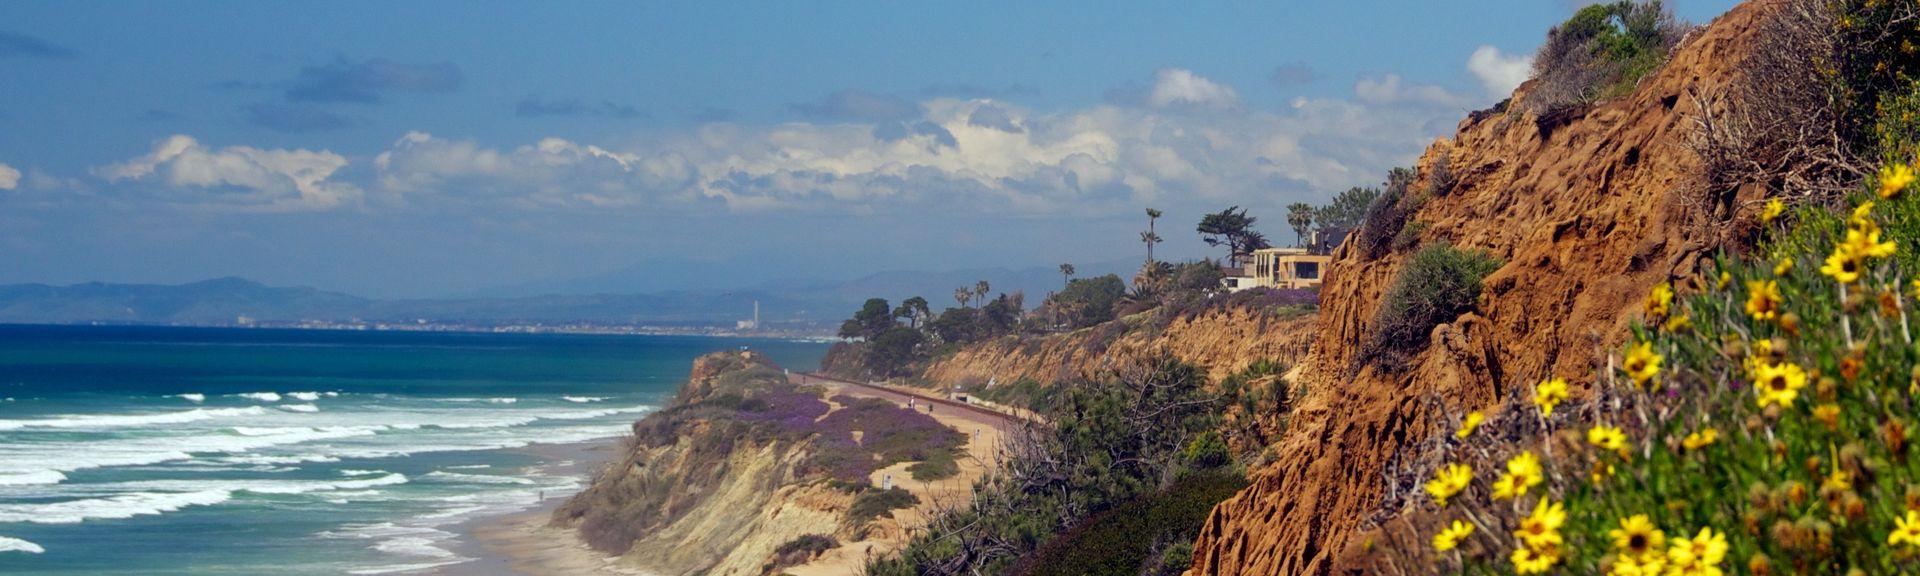 Del Mar-stranden, Del Mar, California, USA